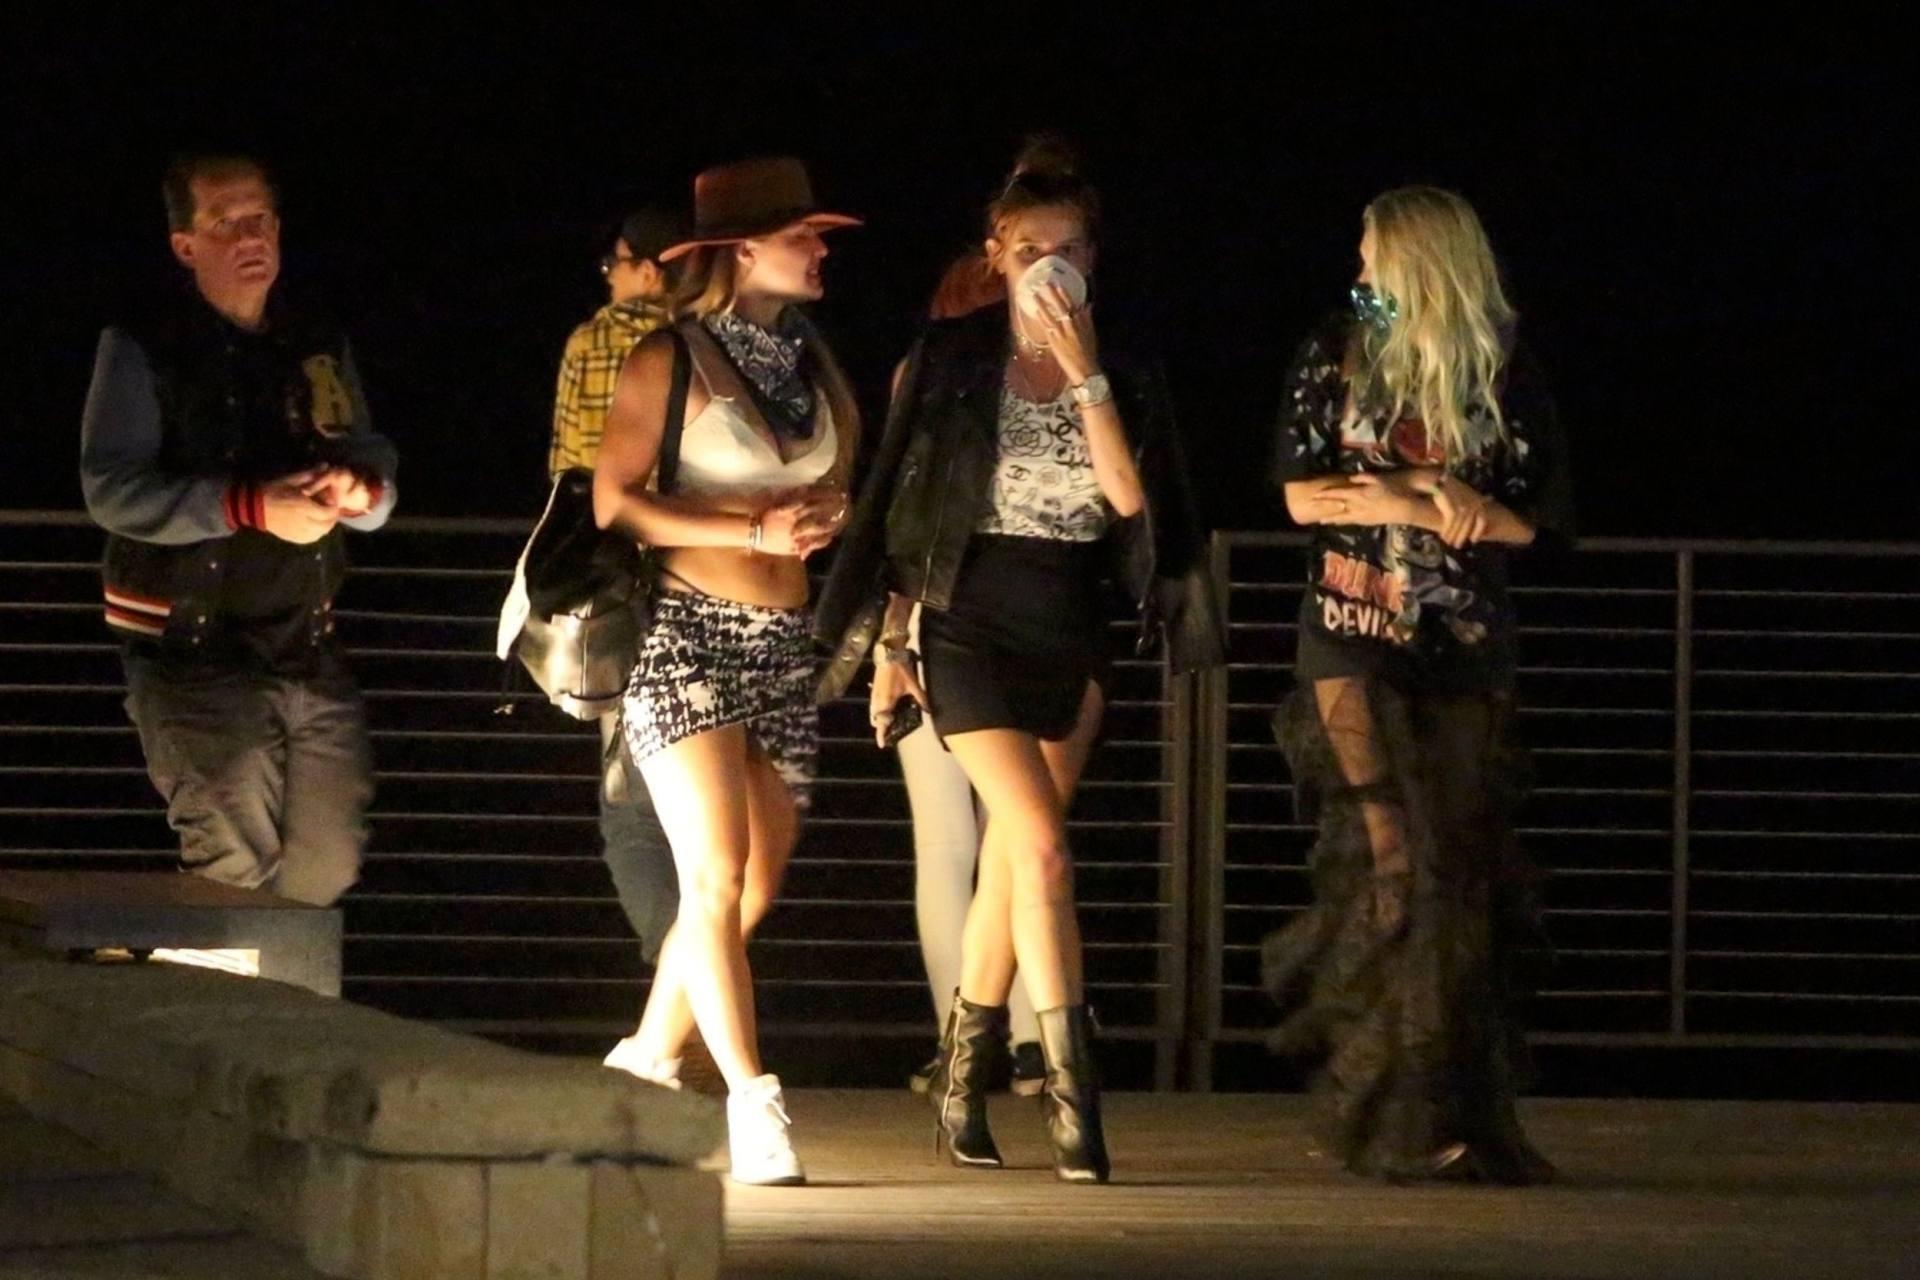 Bella & Dani Thorne – Sexy Legs In Mini Skirts At Nobu In Malibu 0005